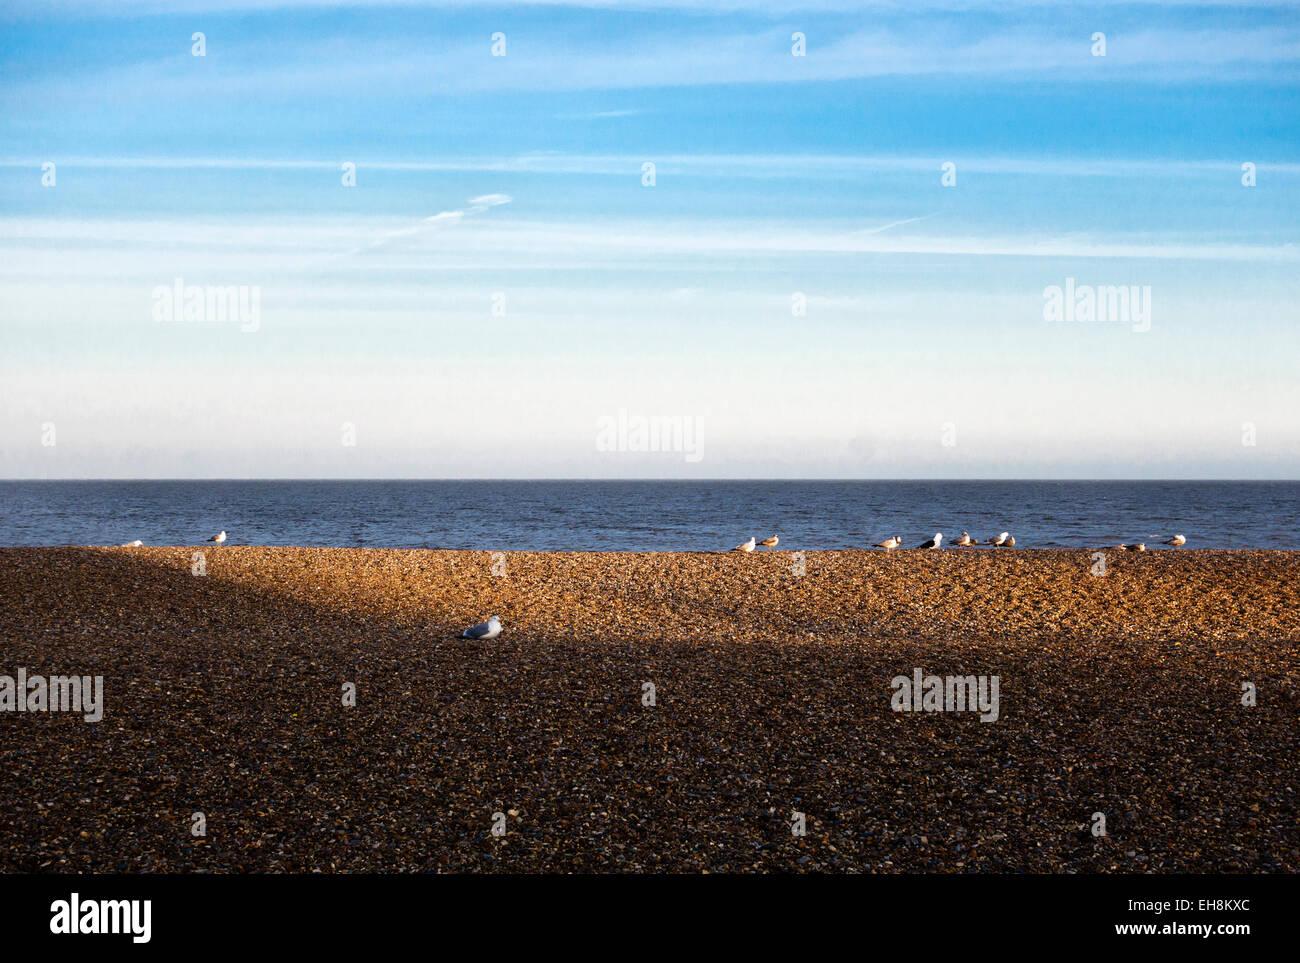 Aldeburgh, Suffolk, UK. Seabirds on the shingle beach at sunset - Stock Image